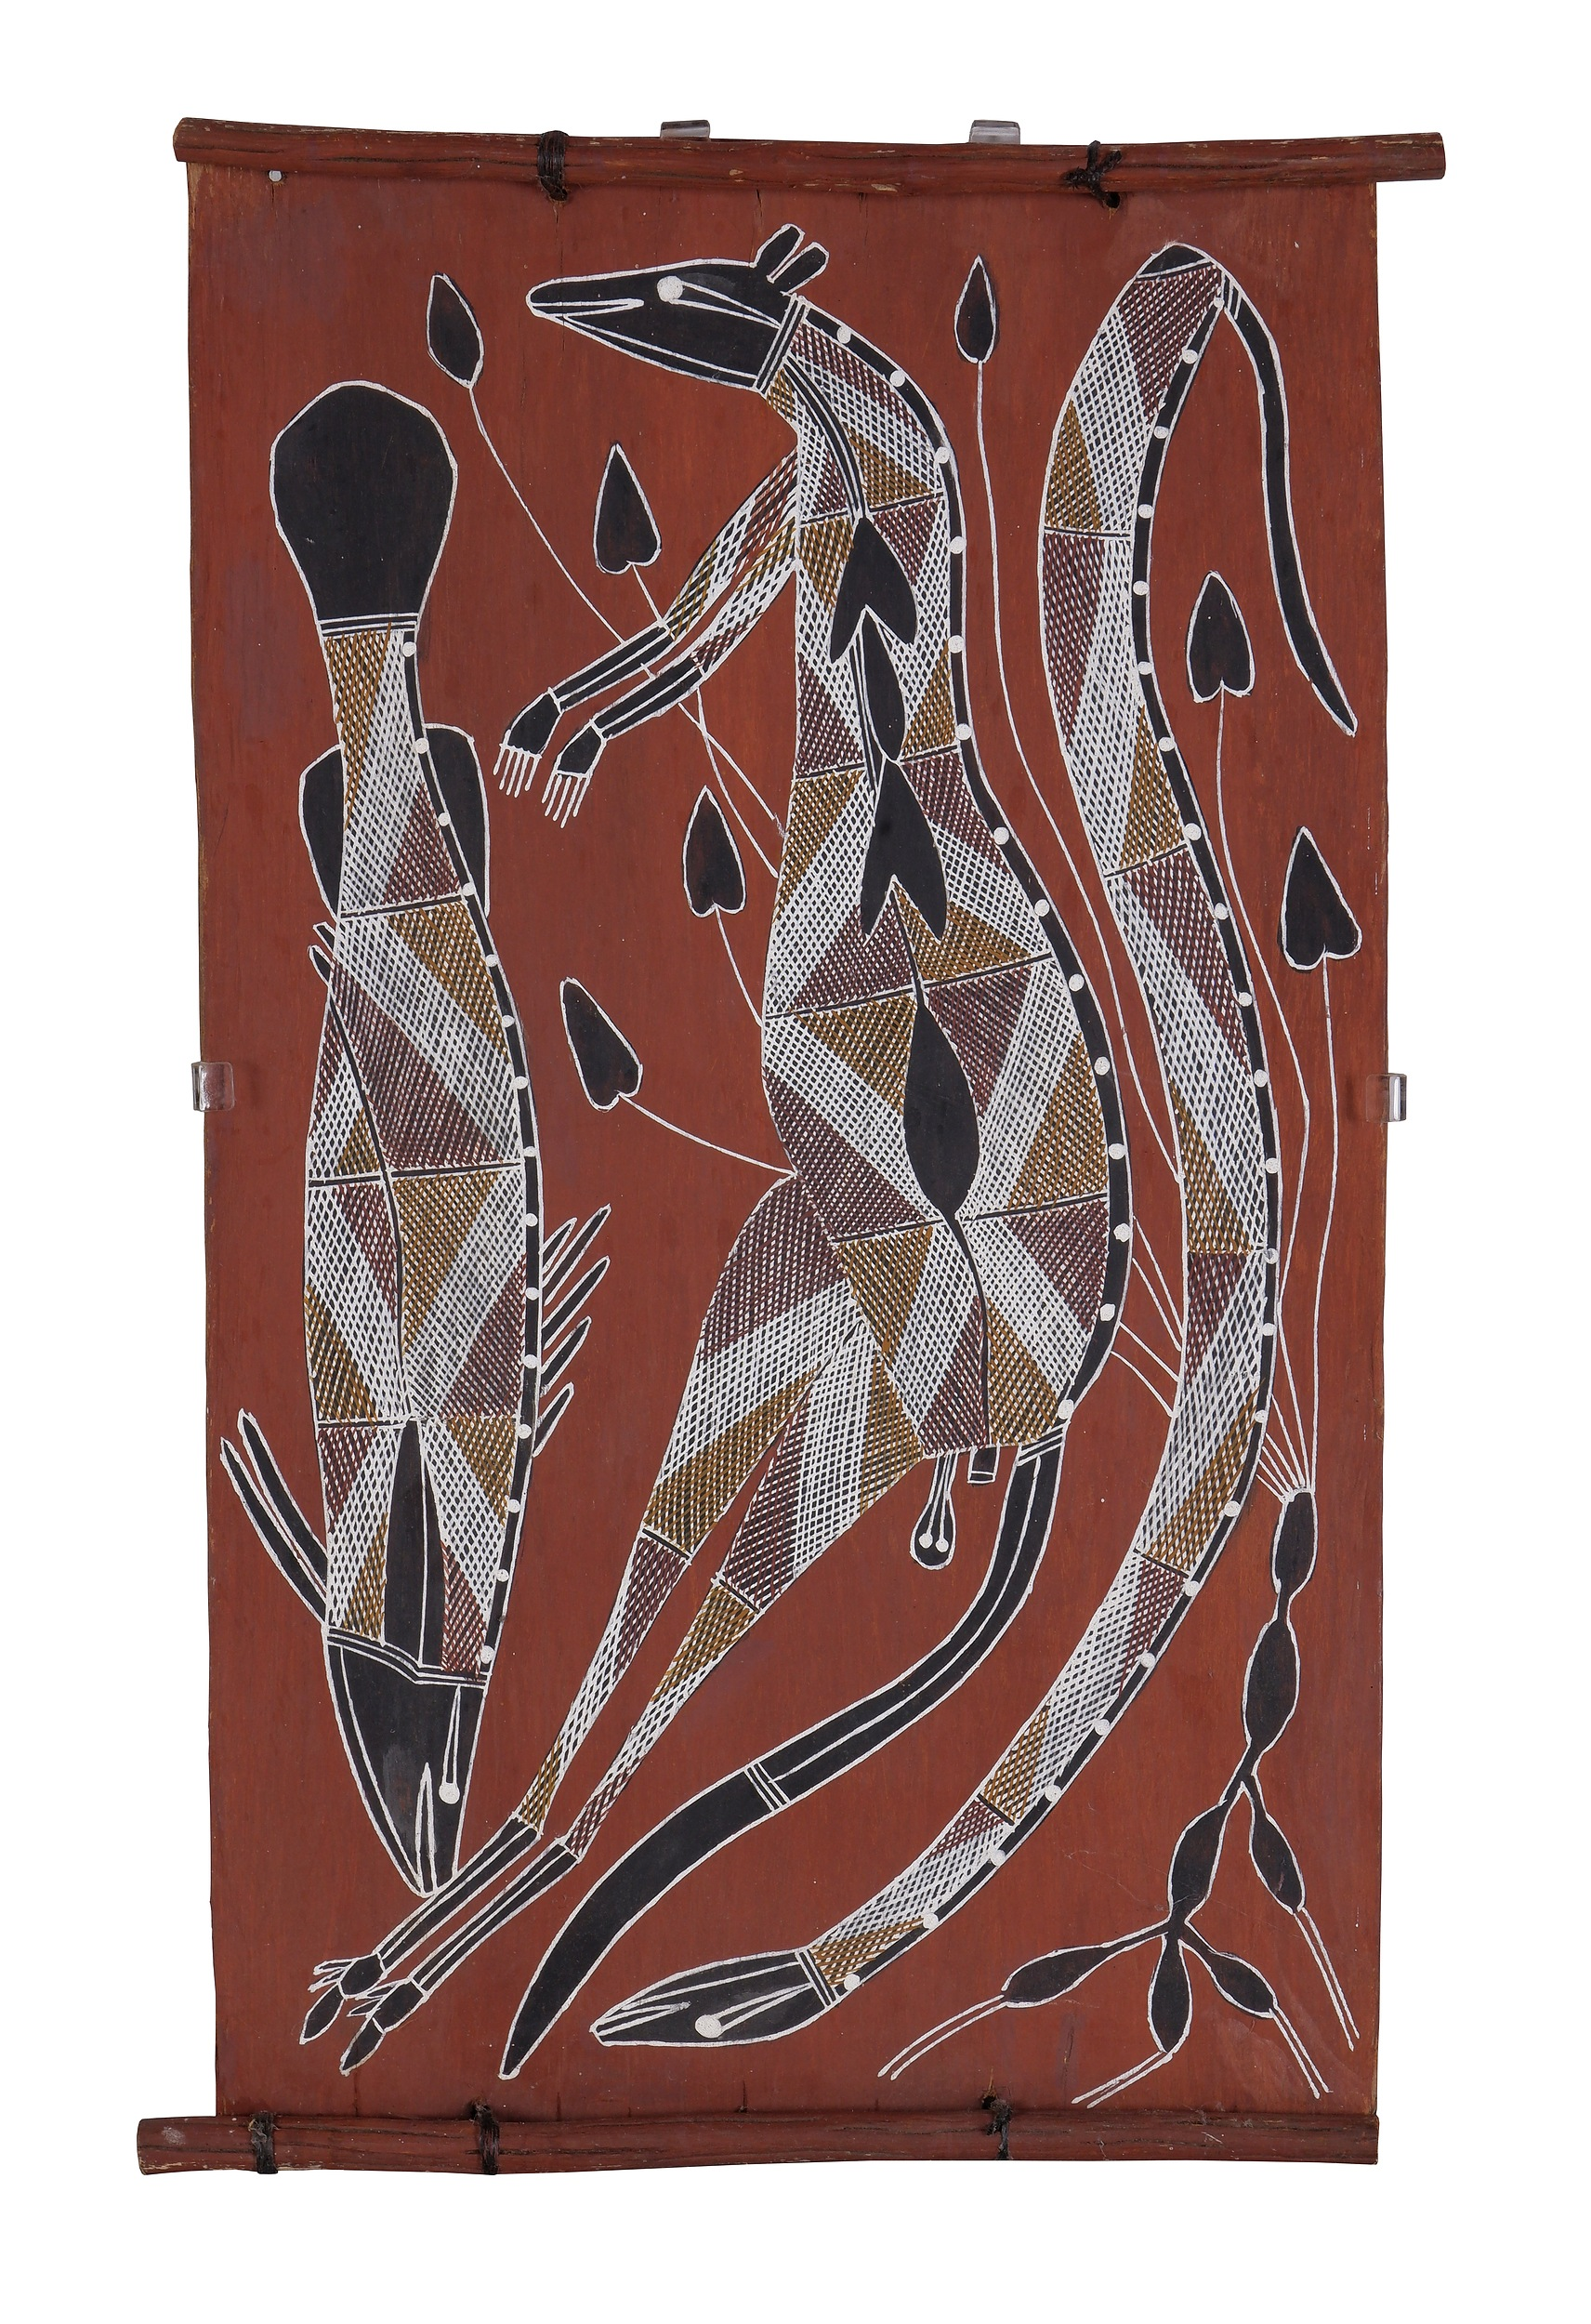 'Audrey Nadjowh (20th Century, Kunwinjku language group), Water Python, Barramundi, Black Rock Wallaby, Earth Pigments on Bark'